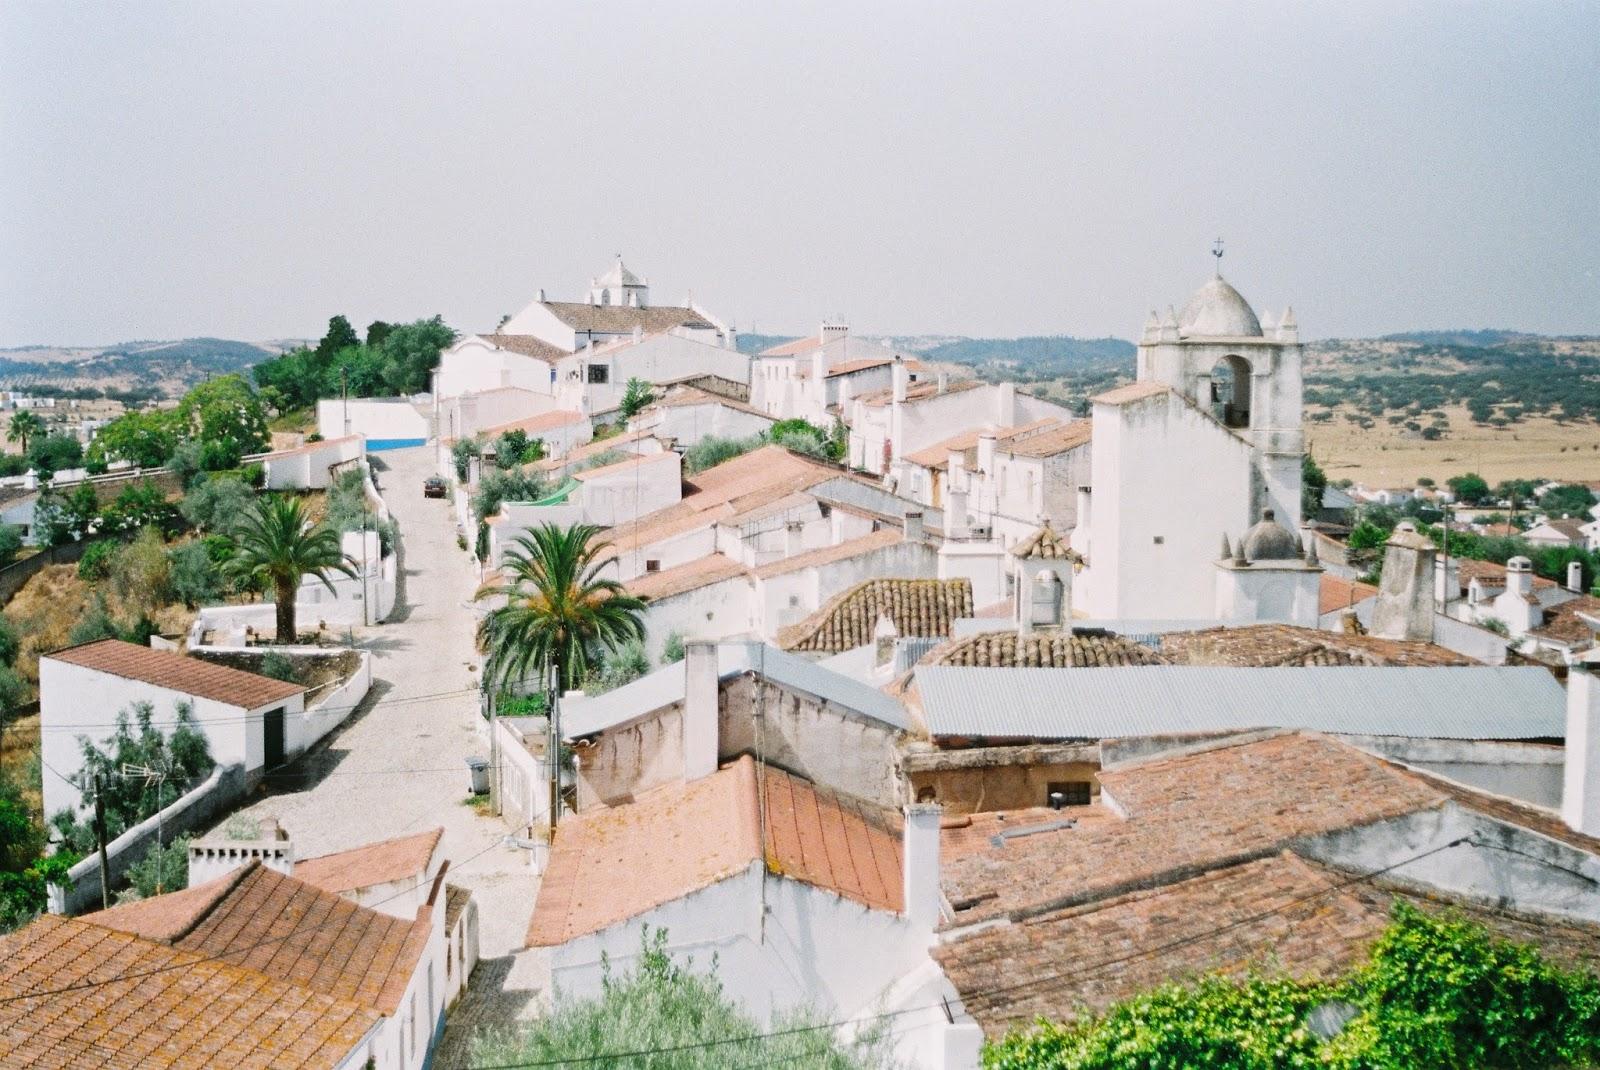 Alentejo Travel Guide - Alandroal, Corval & Terena | oandrajos.blogspot.co.uk